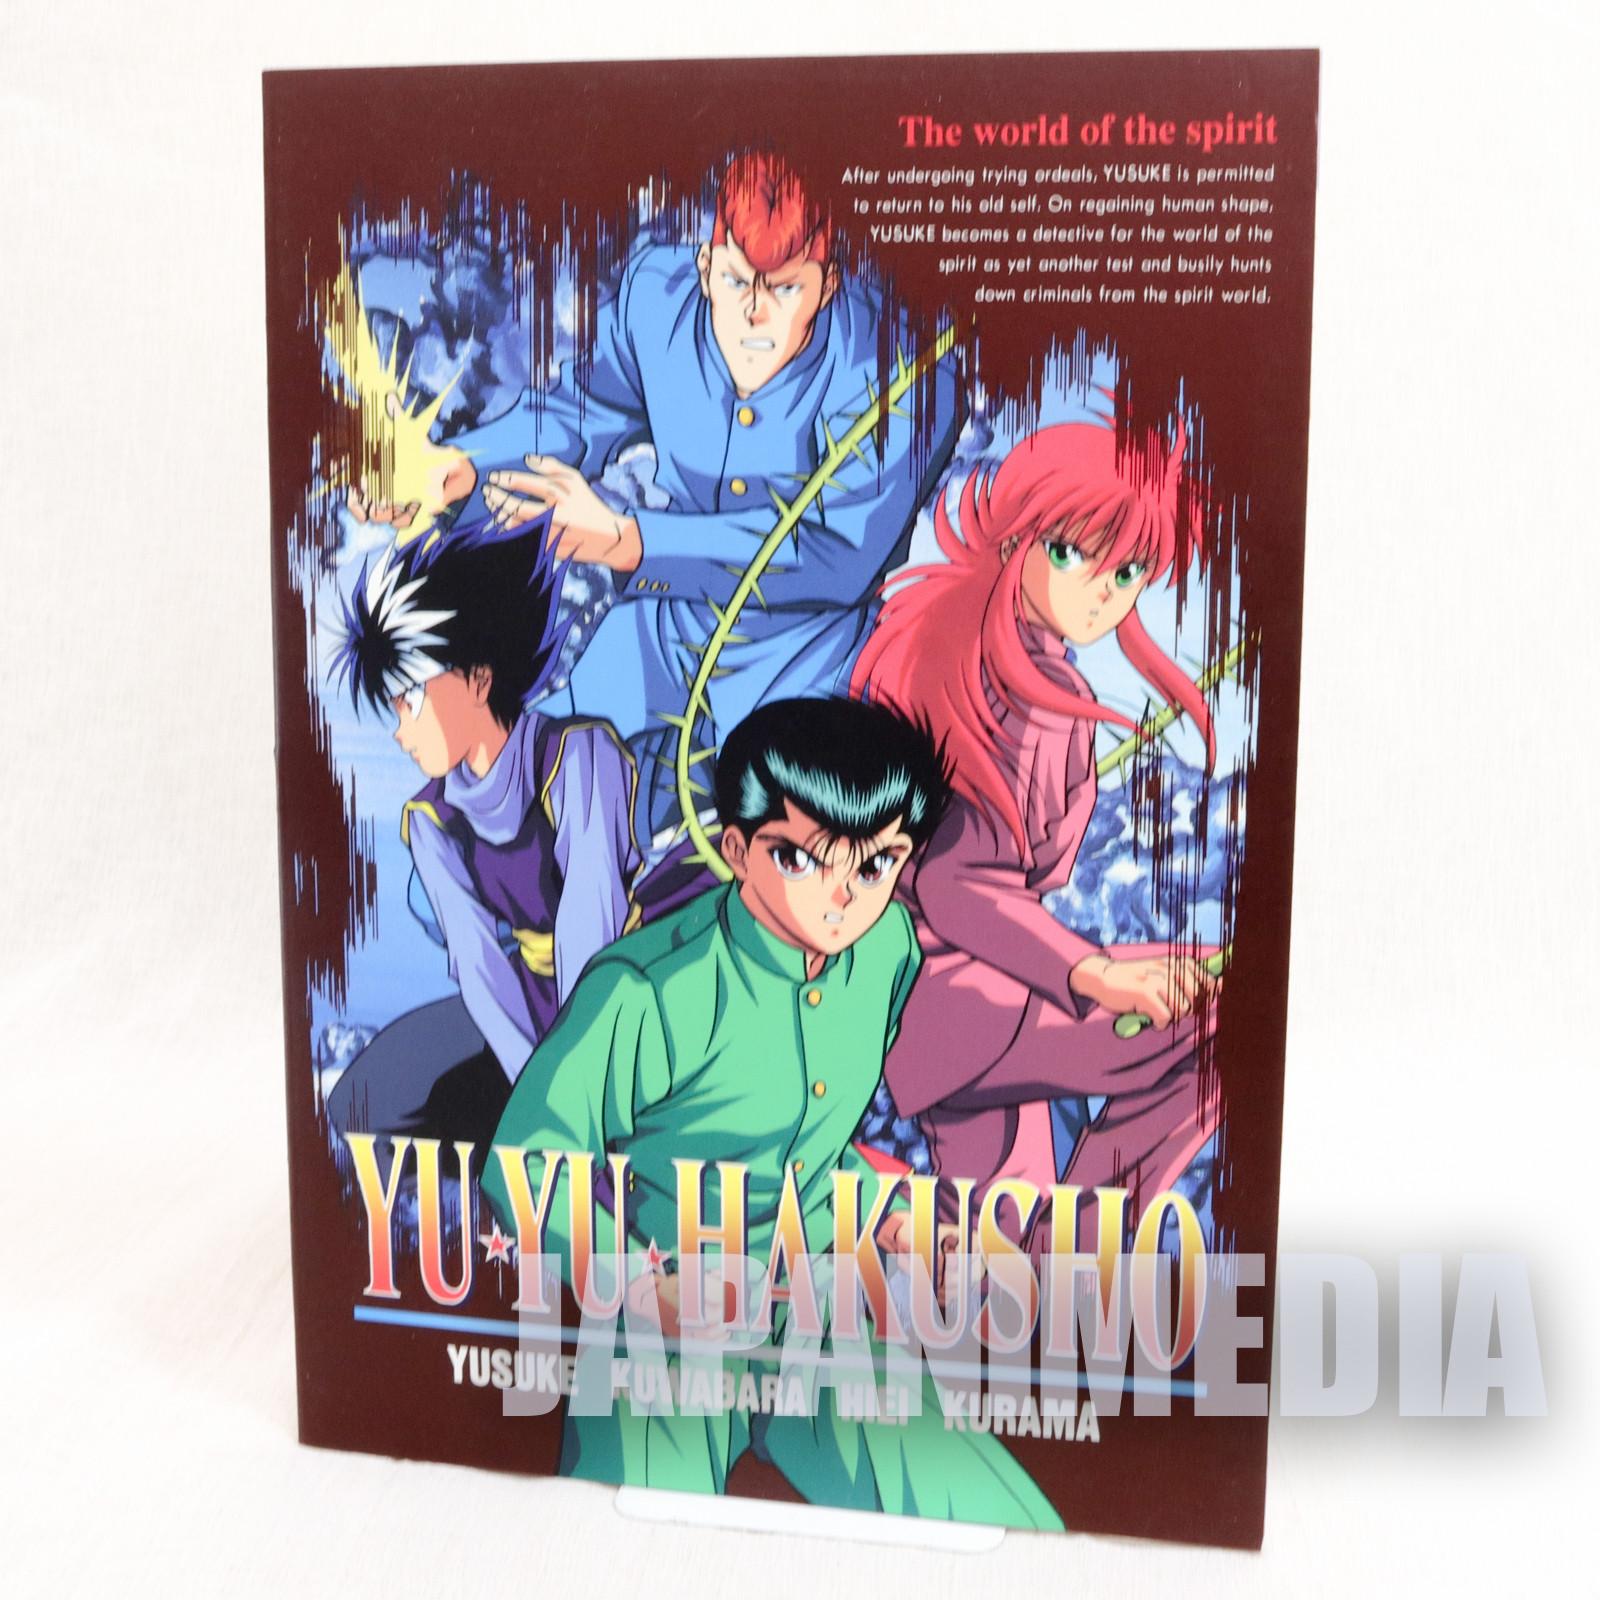 Yu Yu Hakusho Notebook [Yusuke | Kuwabara | Kurama | Hiei] JAPAN ANIME MANGA 2